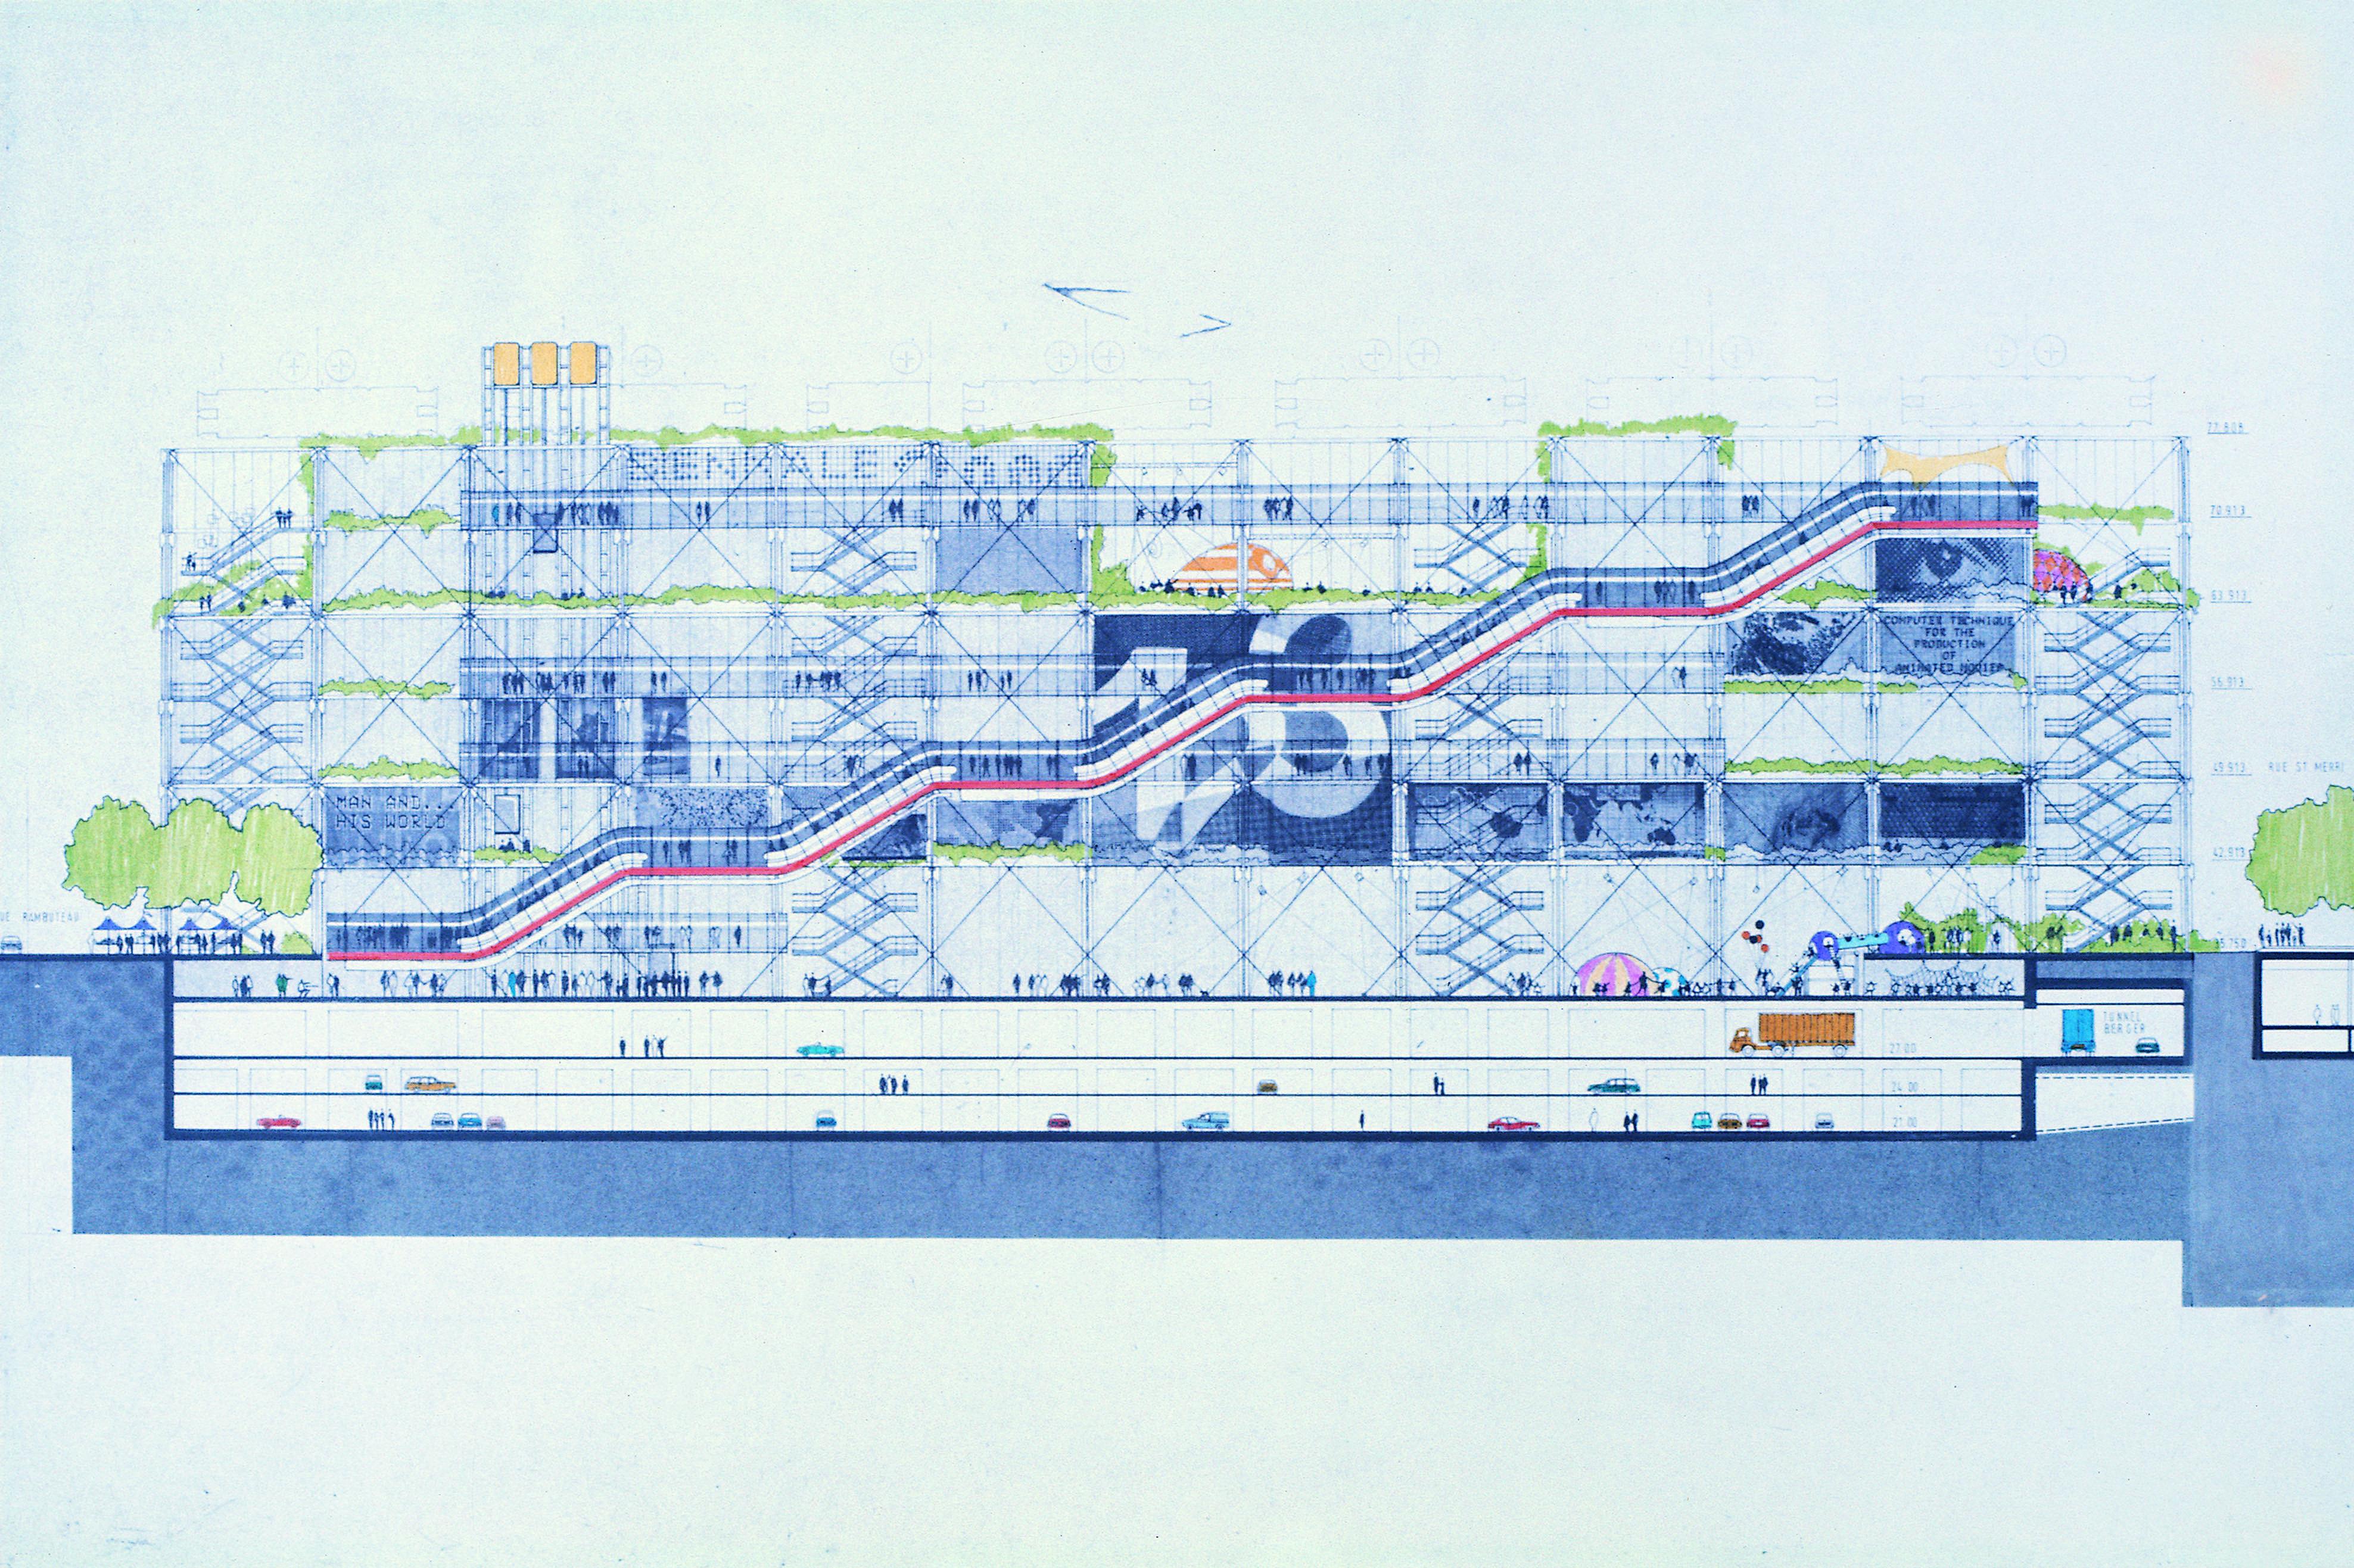 Centre Pompidou Plan Wwwimgkidcom The Image Kid Has It